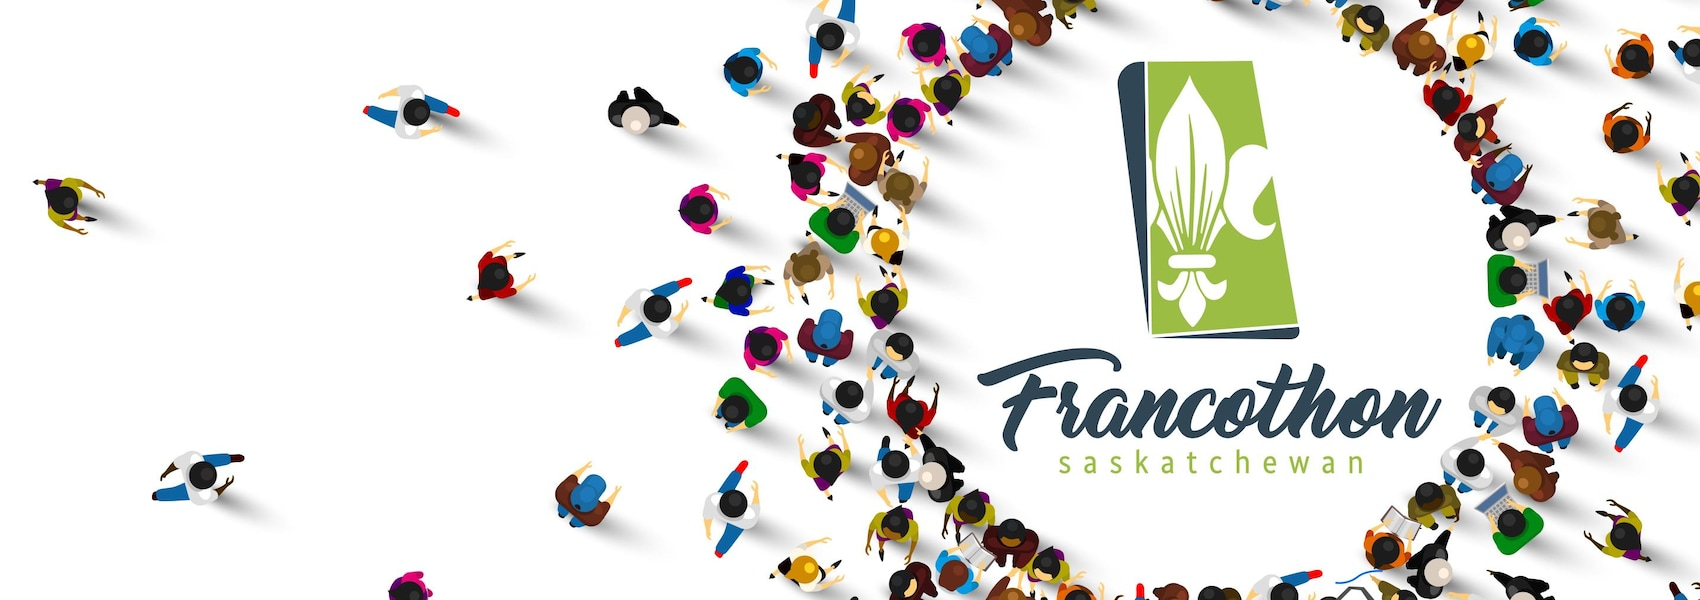 Francothon 2019